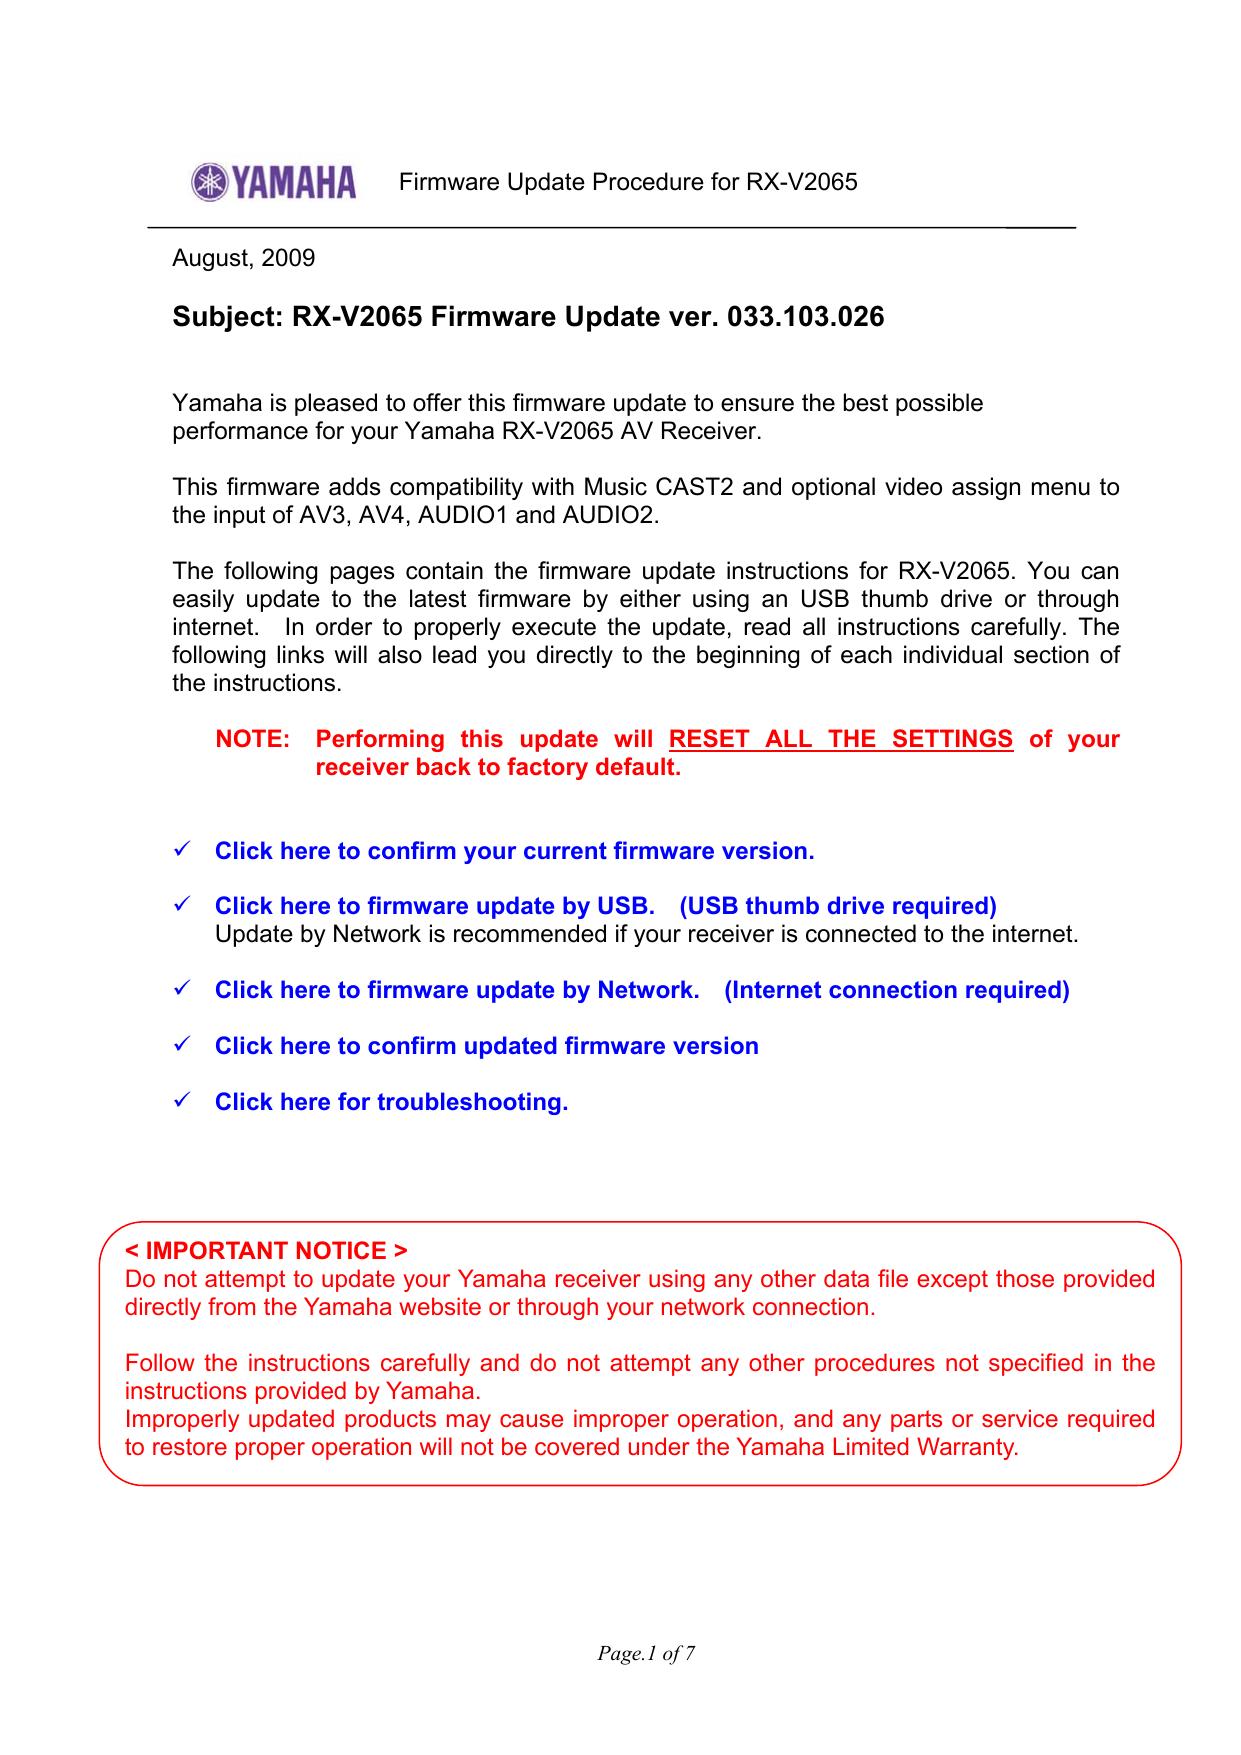 Yamaha RX-V2065 FIRMWARE UPDATE VERSION 033 103 026 (USA